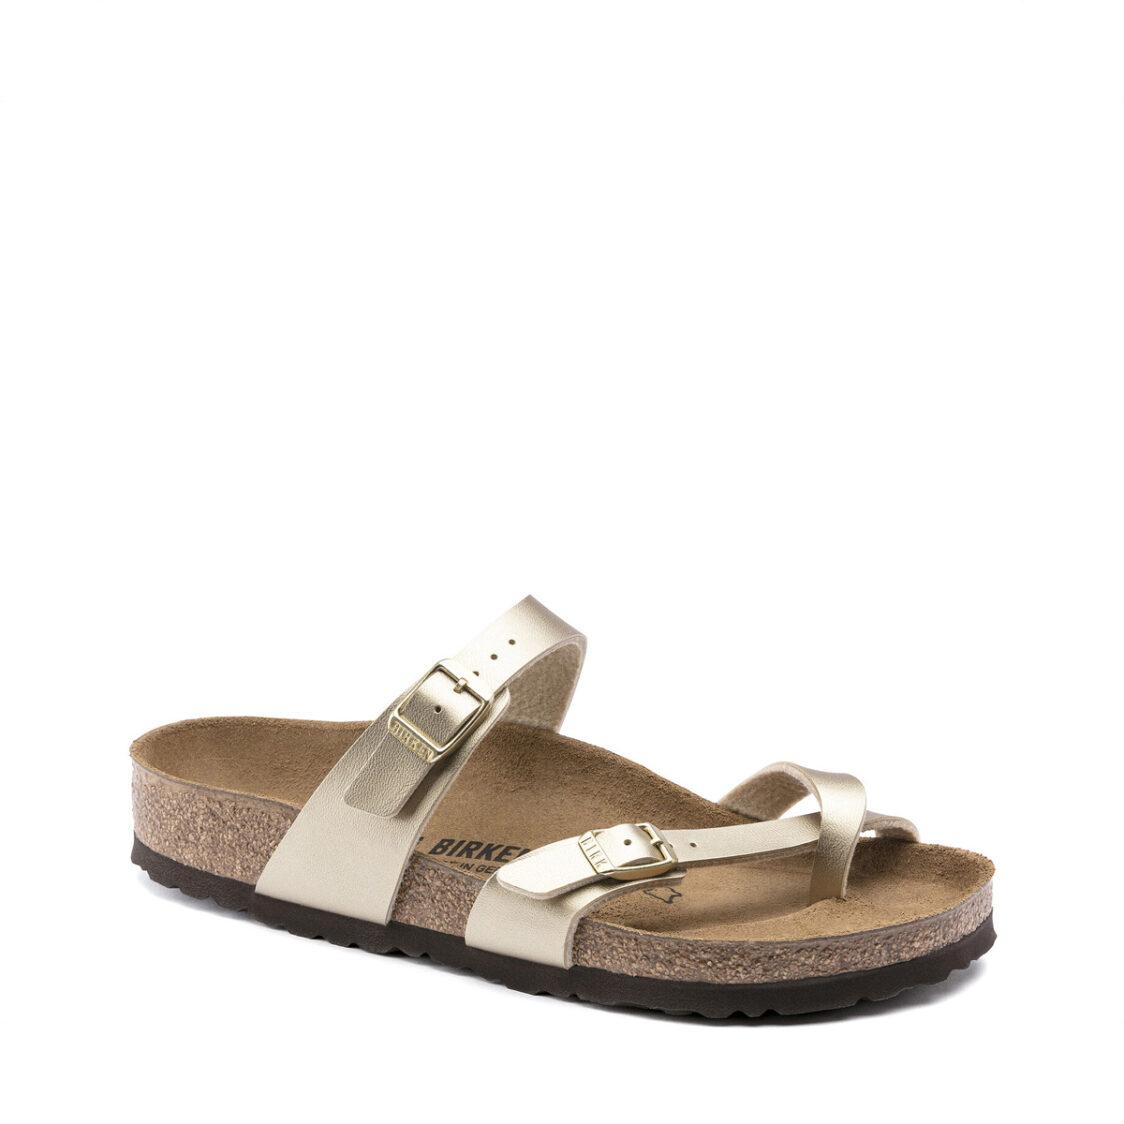 Birkenstock Mayari Birko-Flor Womens Regular Width Sandals Gold